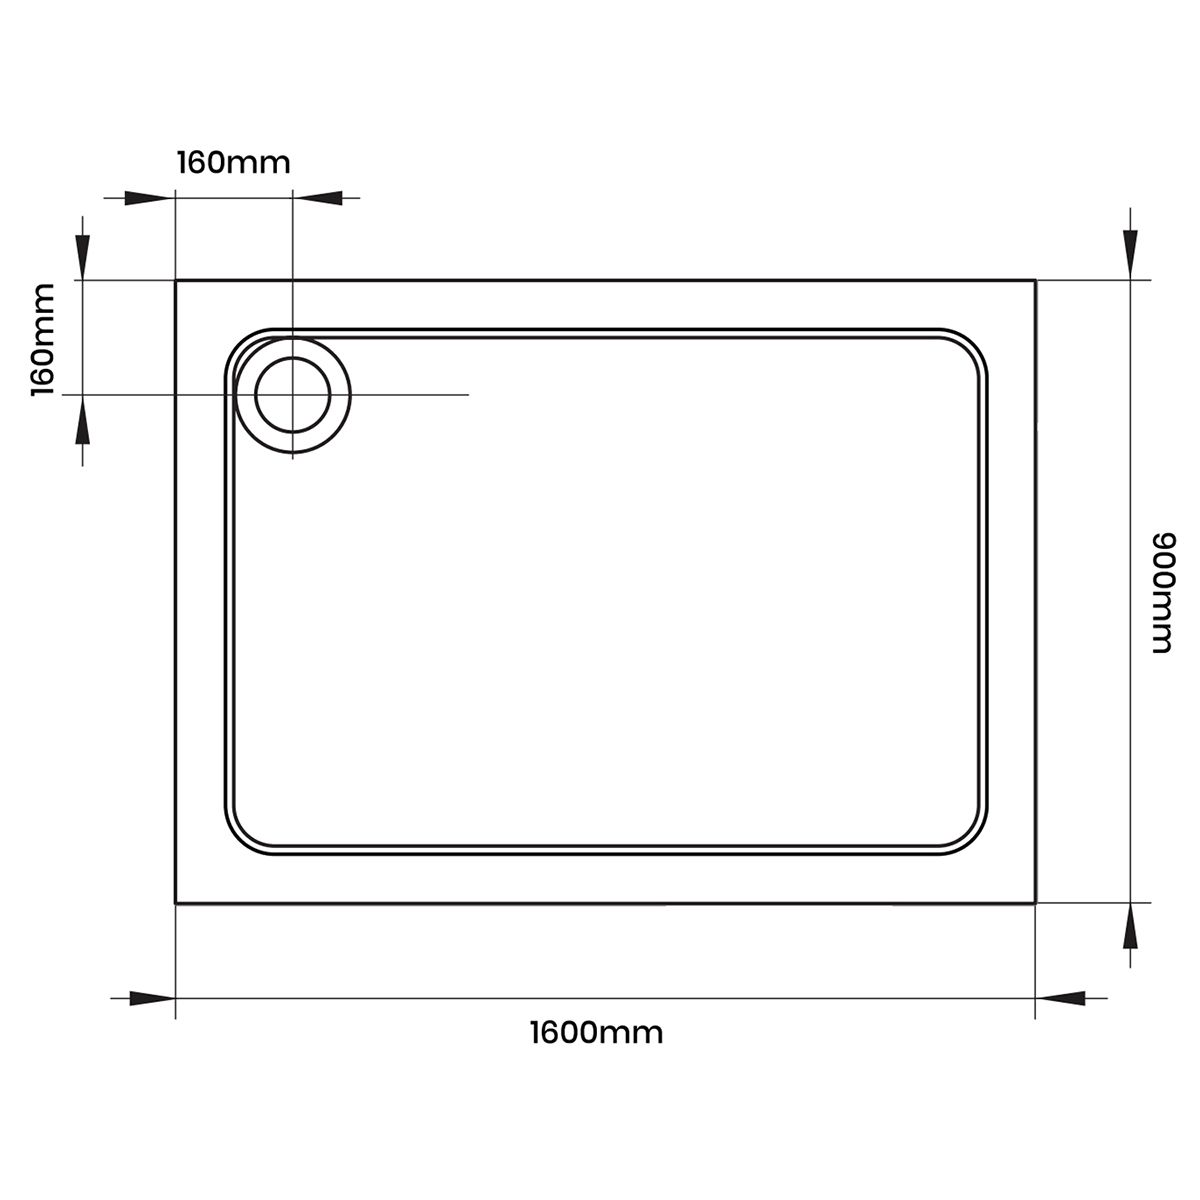 Aquadart Rectangular 1600 x 900 Shower Tray Diemnsions